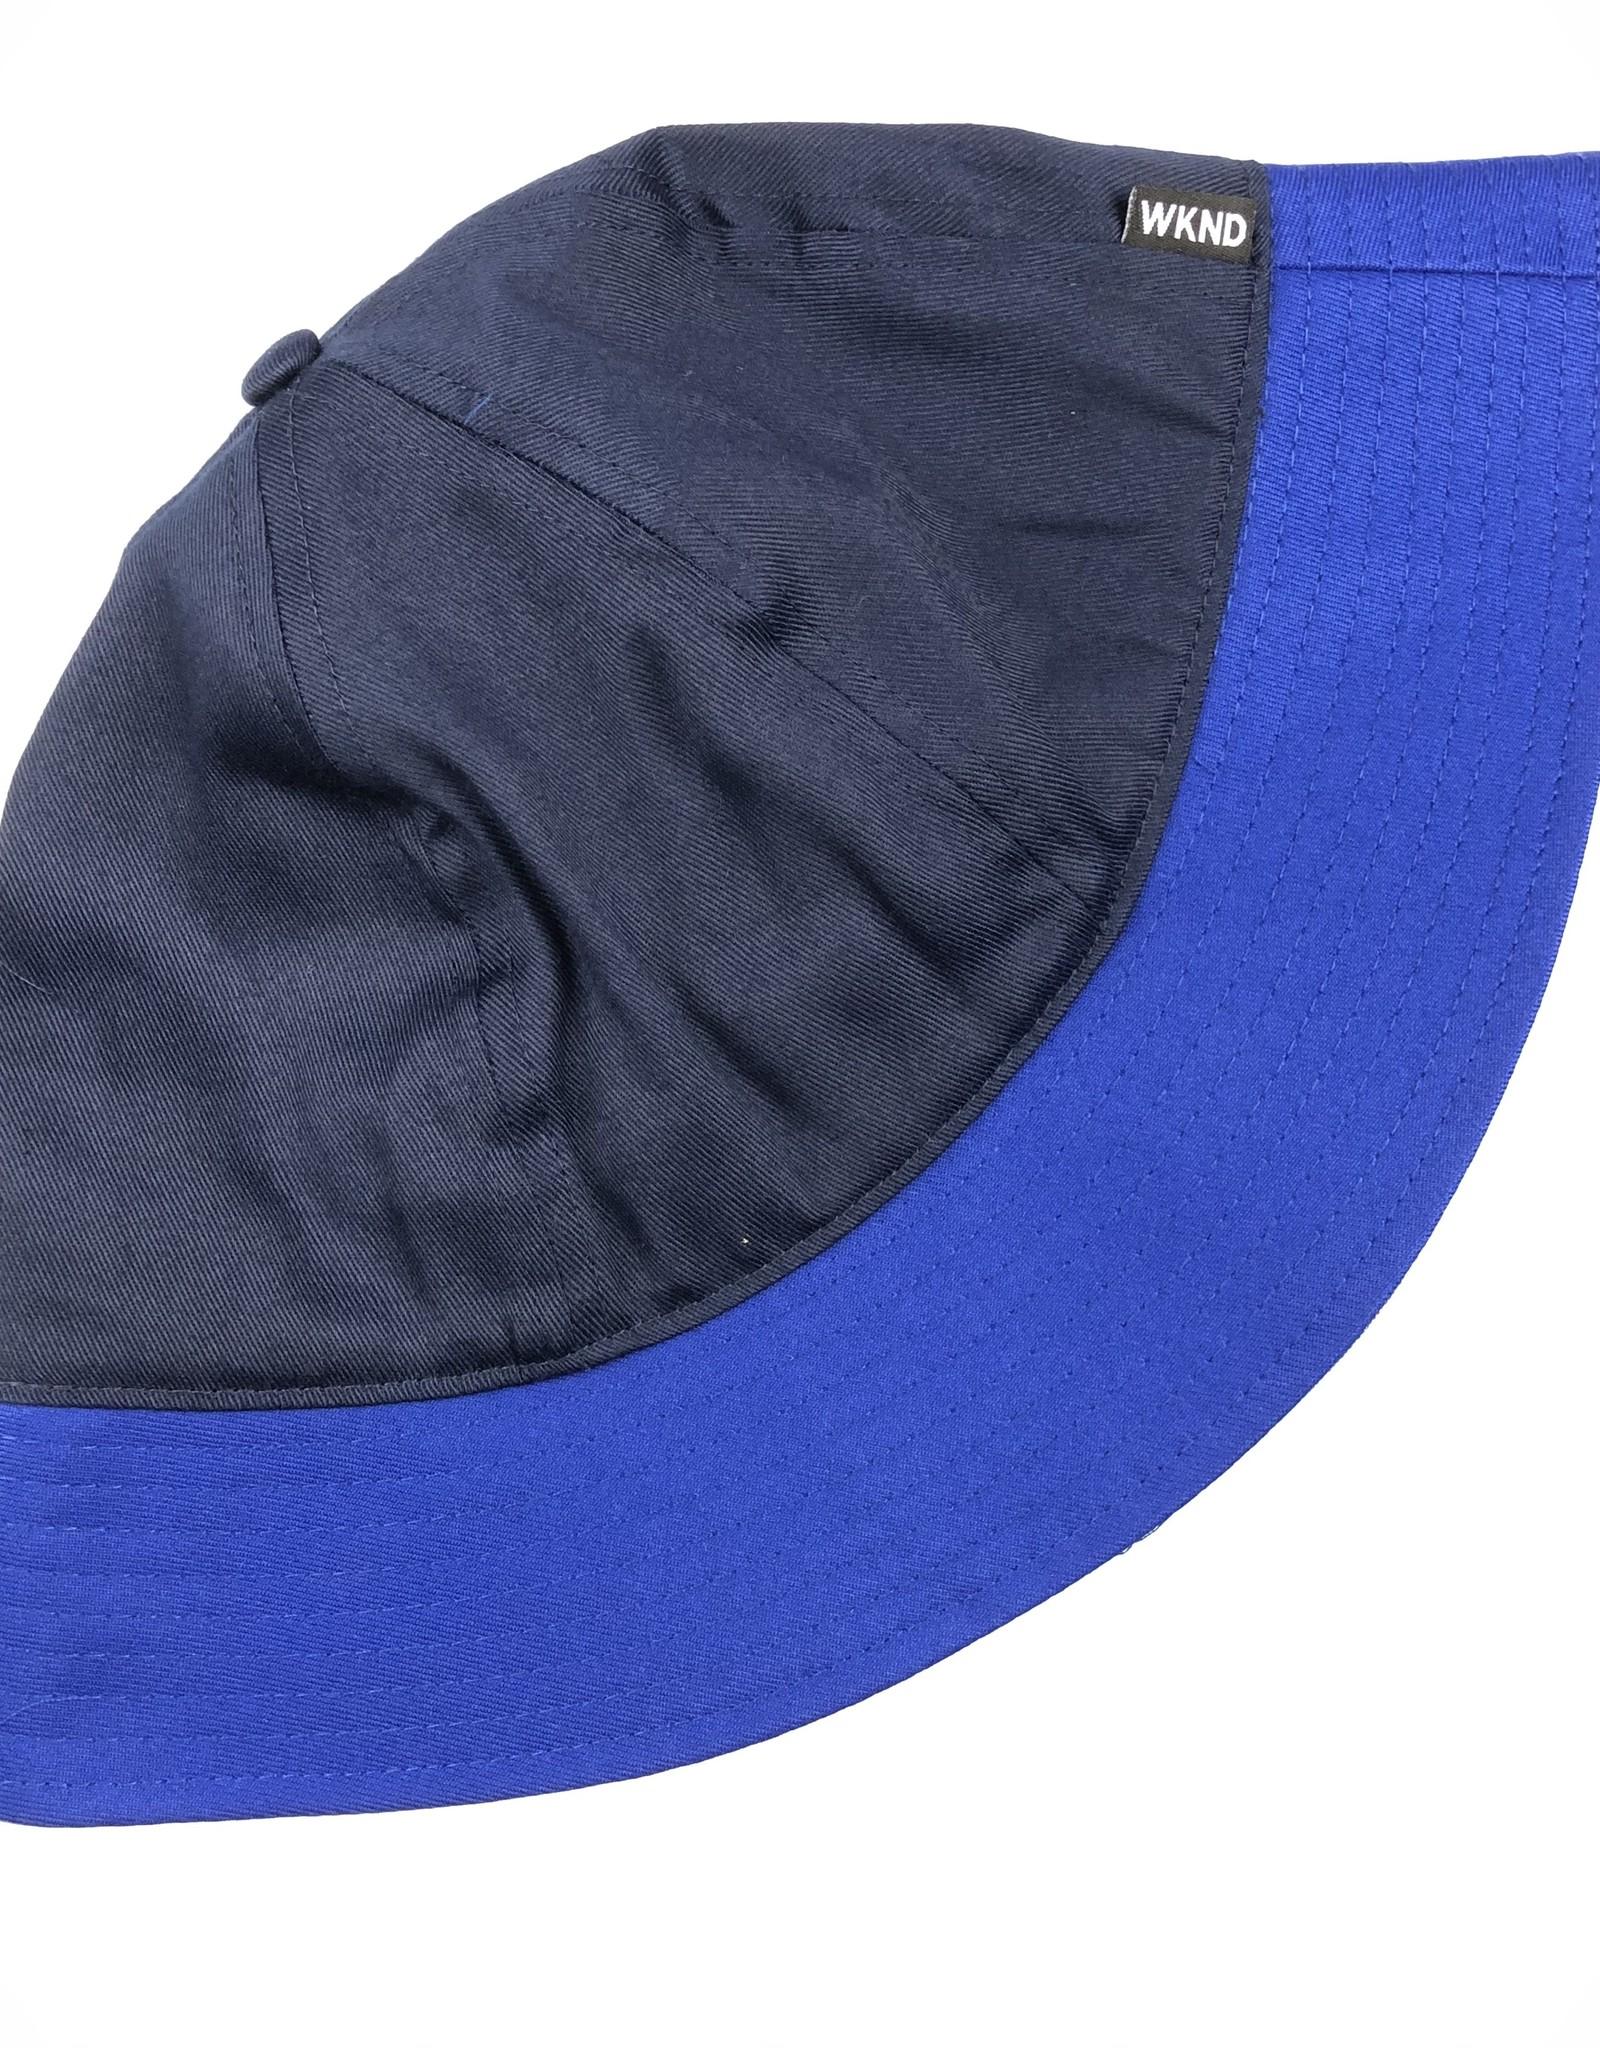 WKND BLUE BUCKET HAT - BLUE/NAVY